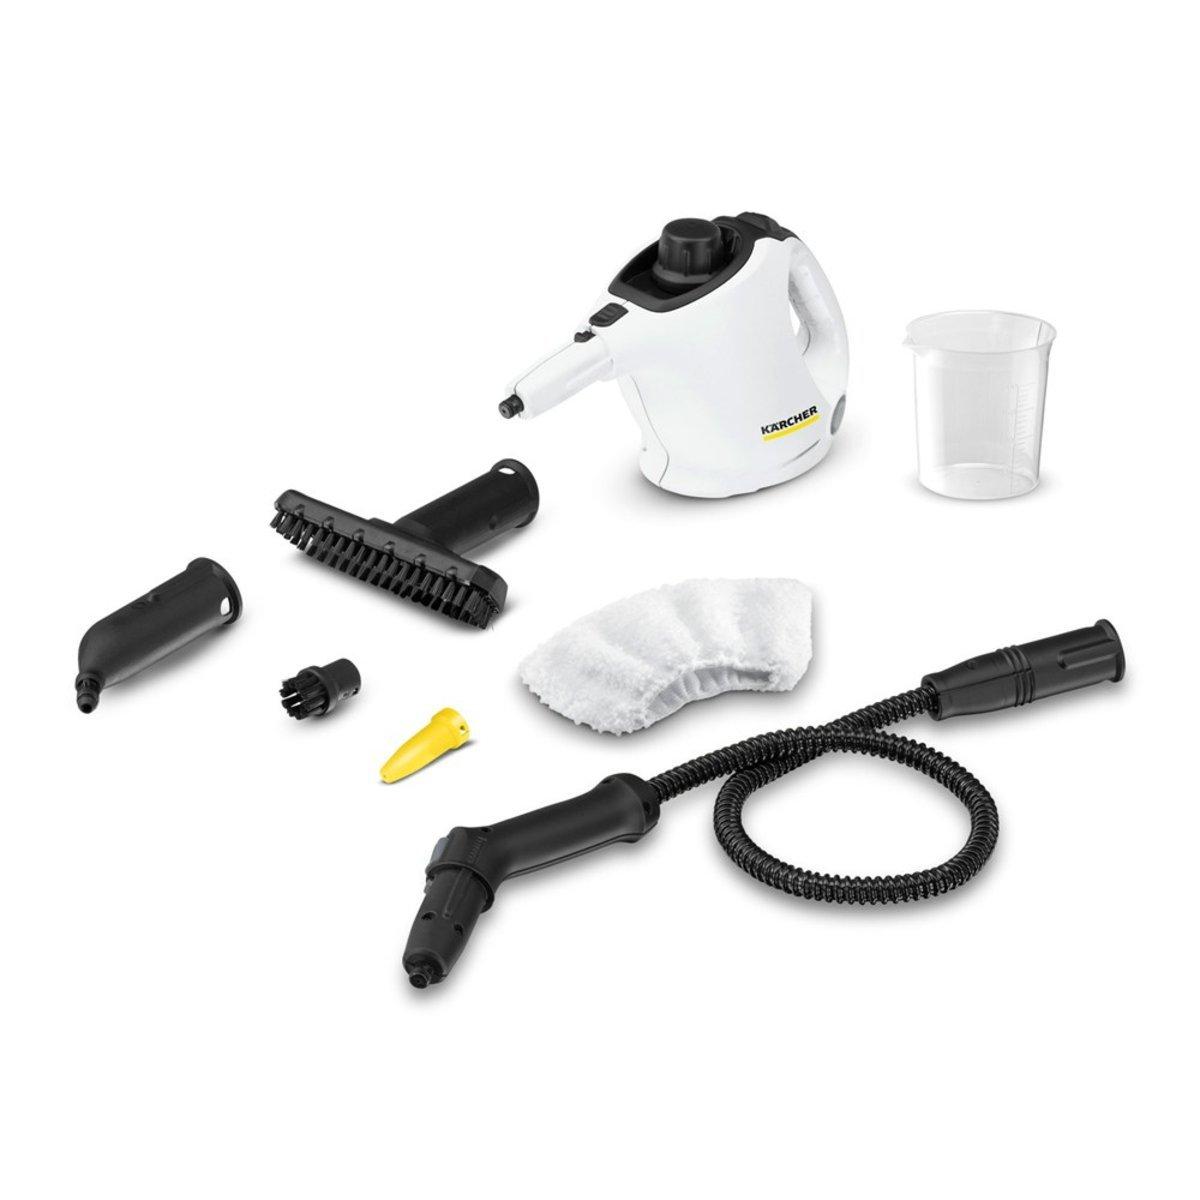 手提蒸氣清洗機 SC1 Premium-W